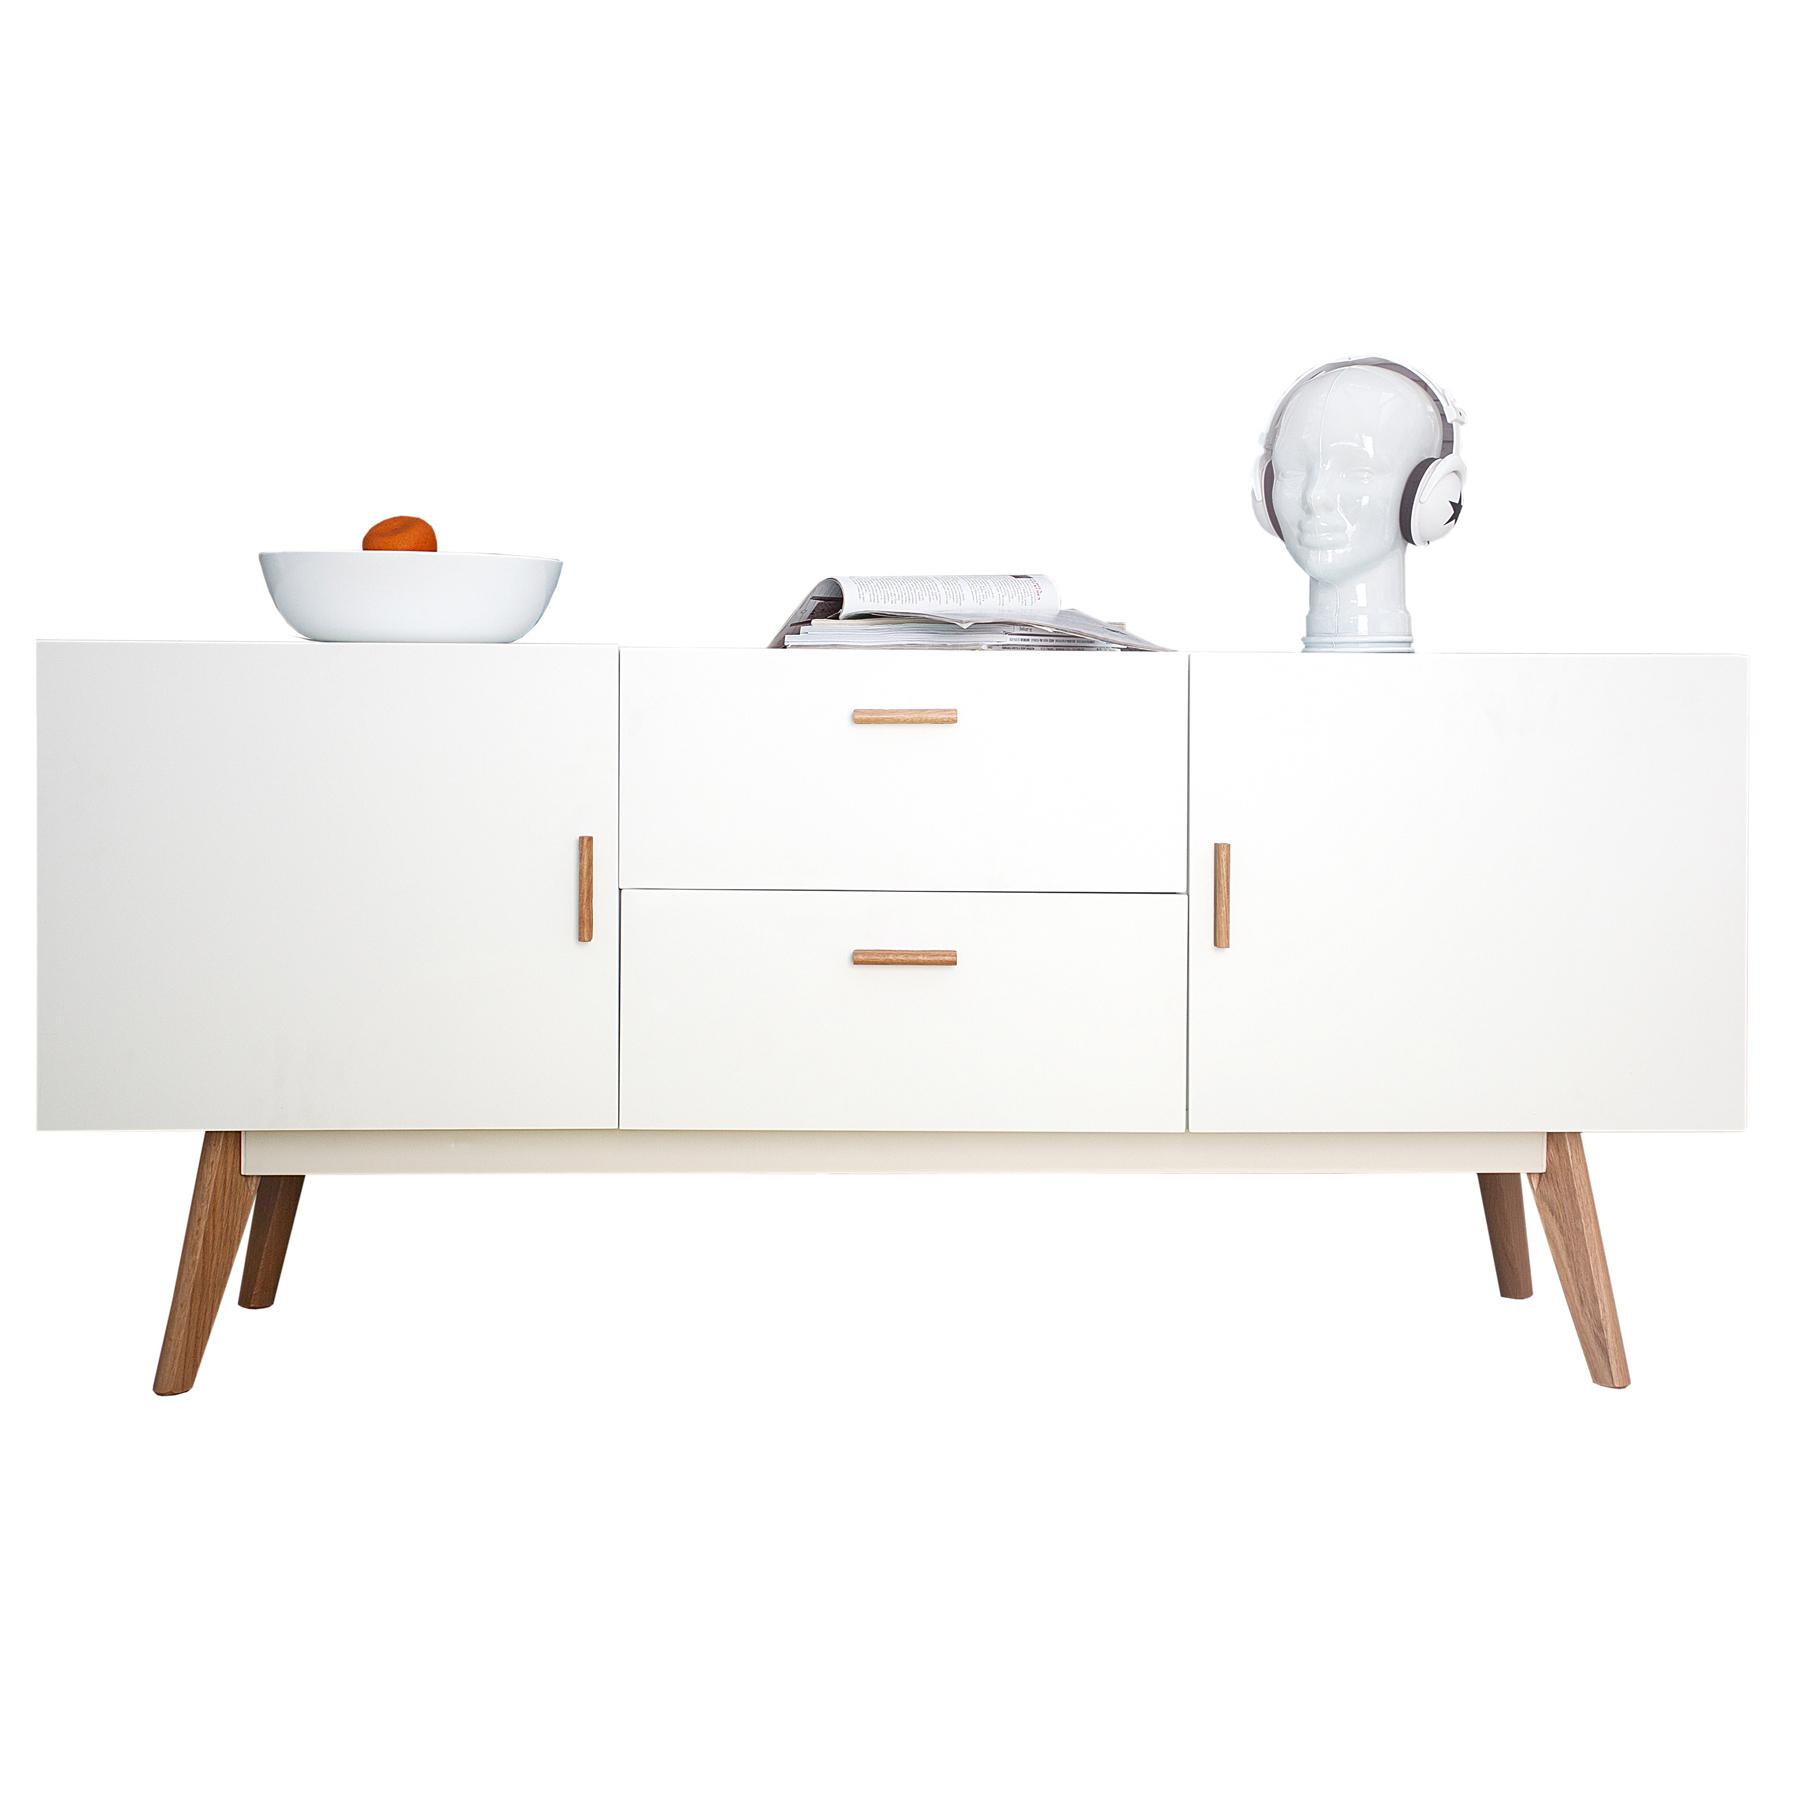 sideboard scandinavia 160cm wei eiche anrichte kommode. Black Bedroom Furniture Sets. Home Design Ideas